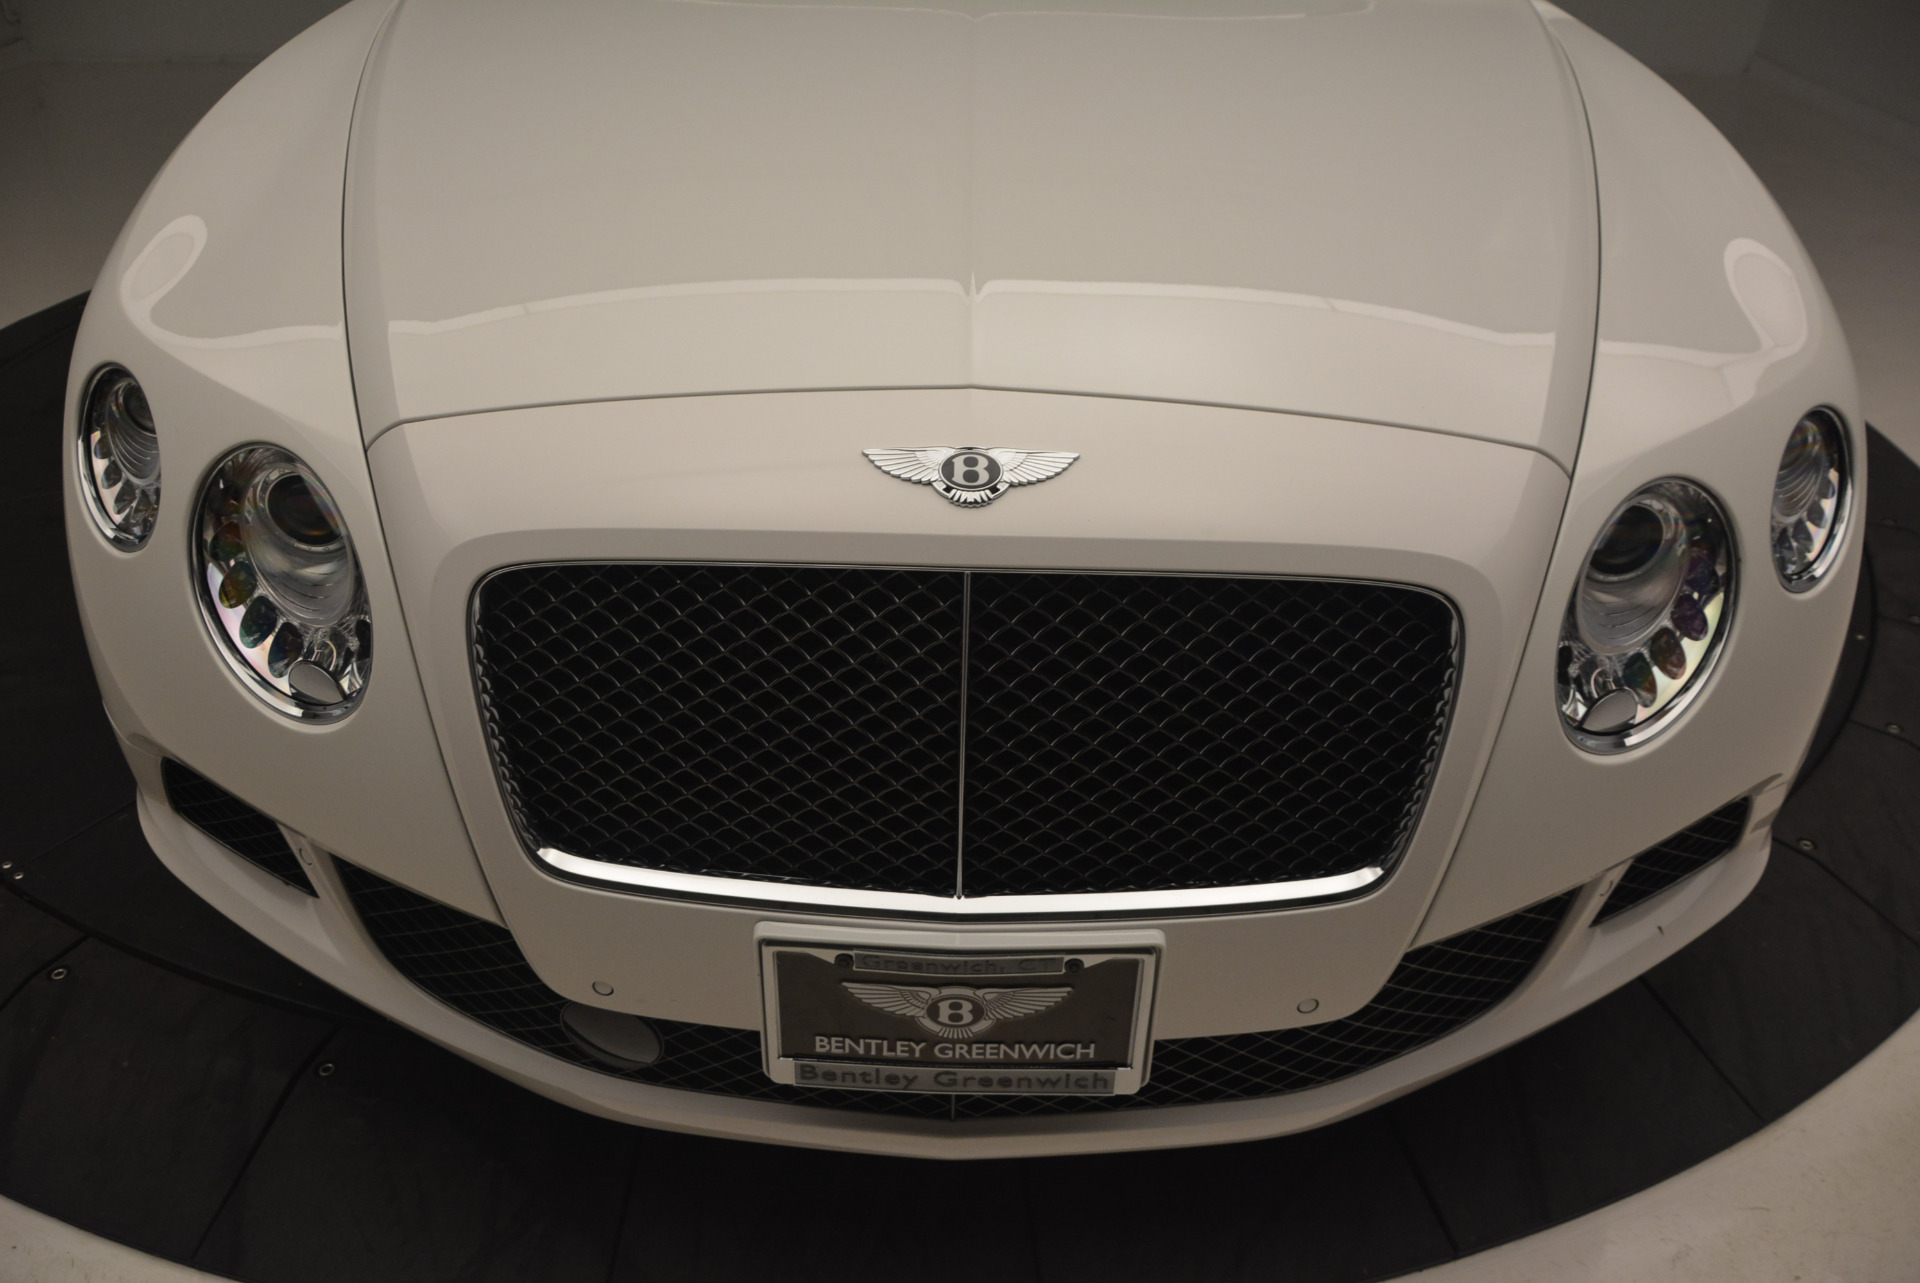 Used 2014 Bentley Continental GT Speed For Sale In Westport, CT 1129_p25